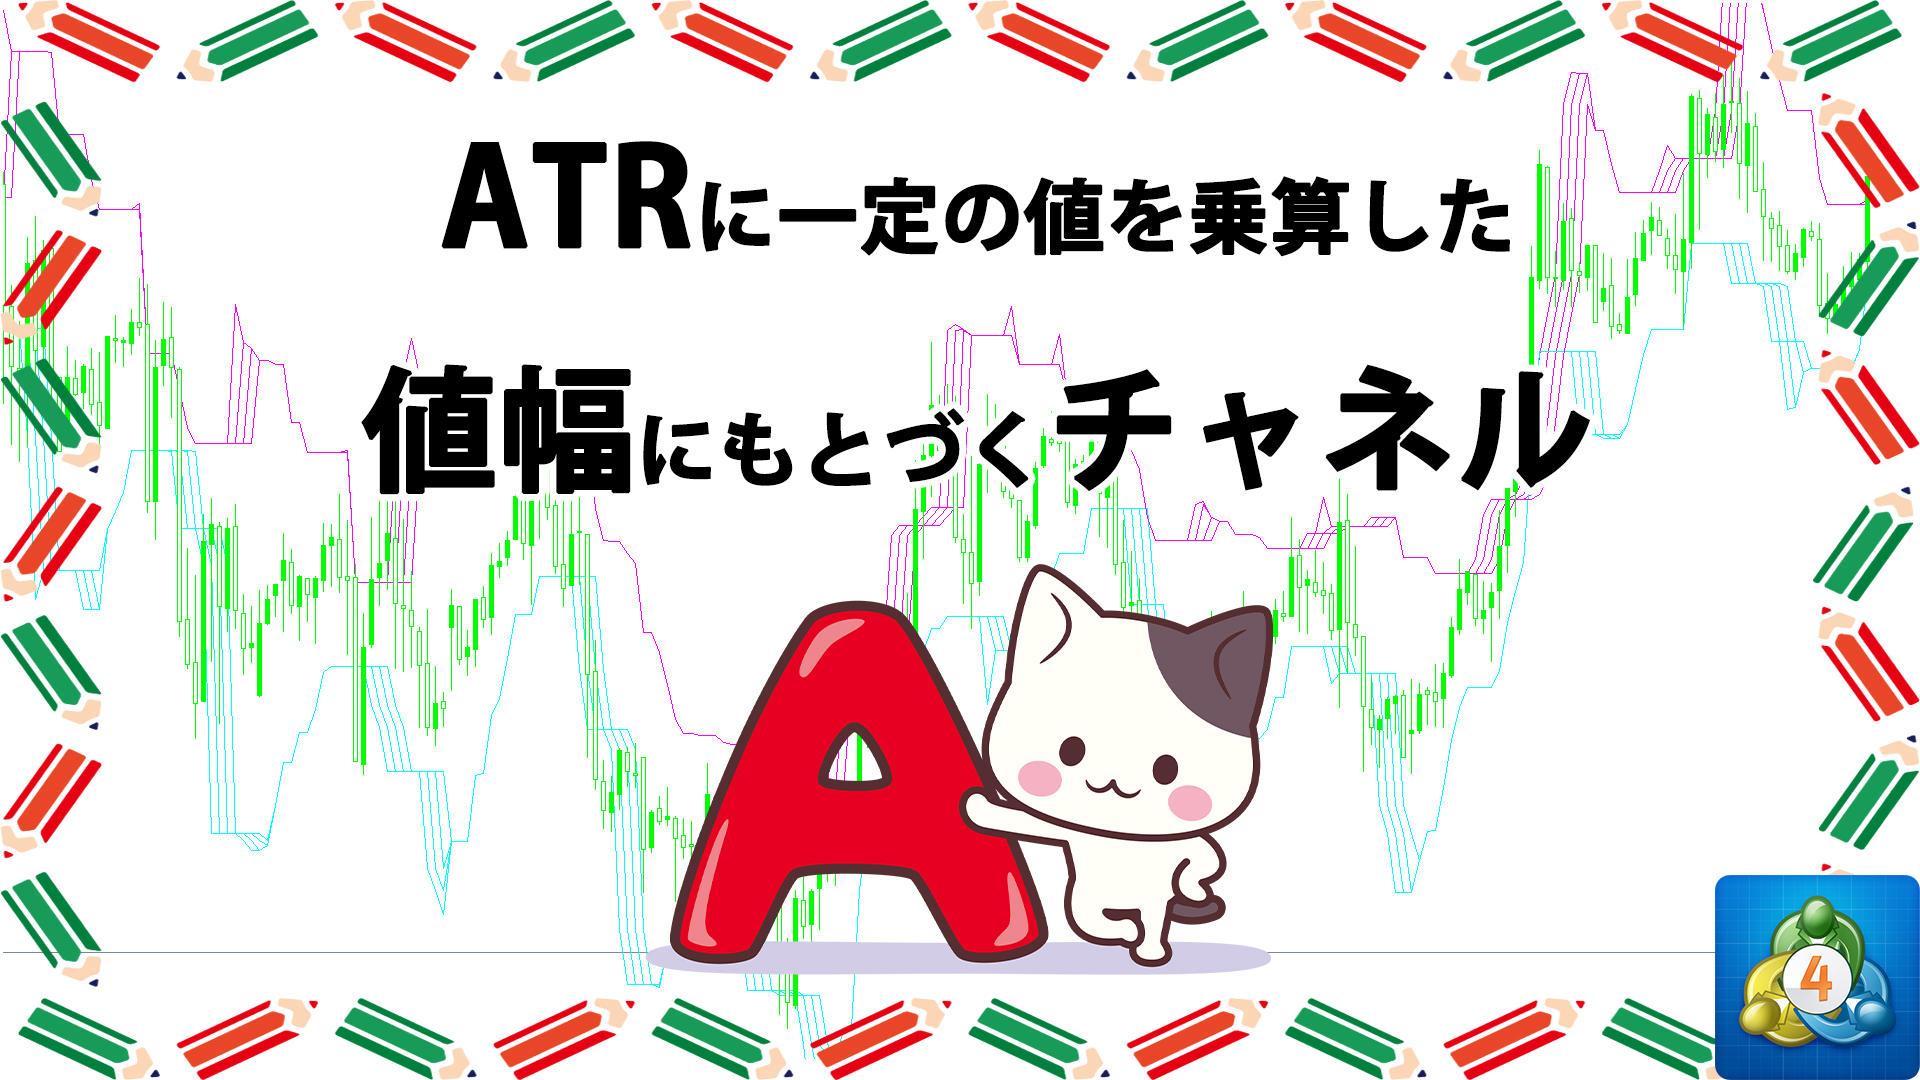 ATRに一定の値を乗算した値幅にもとづいてチャネルを表示するMT4インジケーター「VTS_VG_G2」